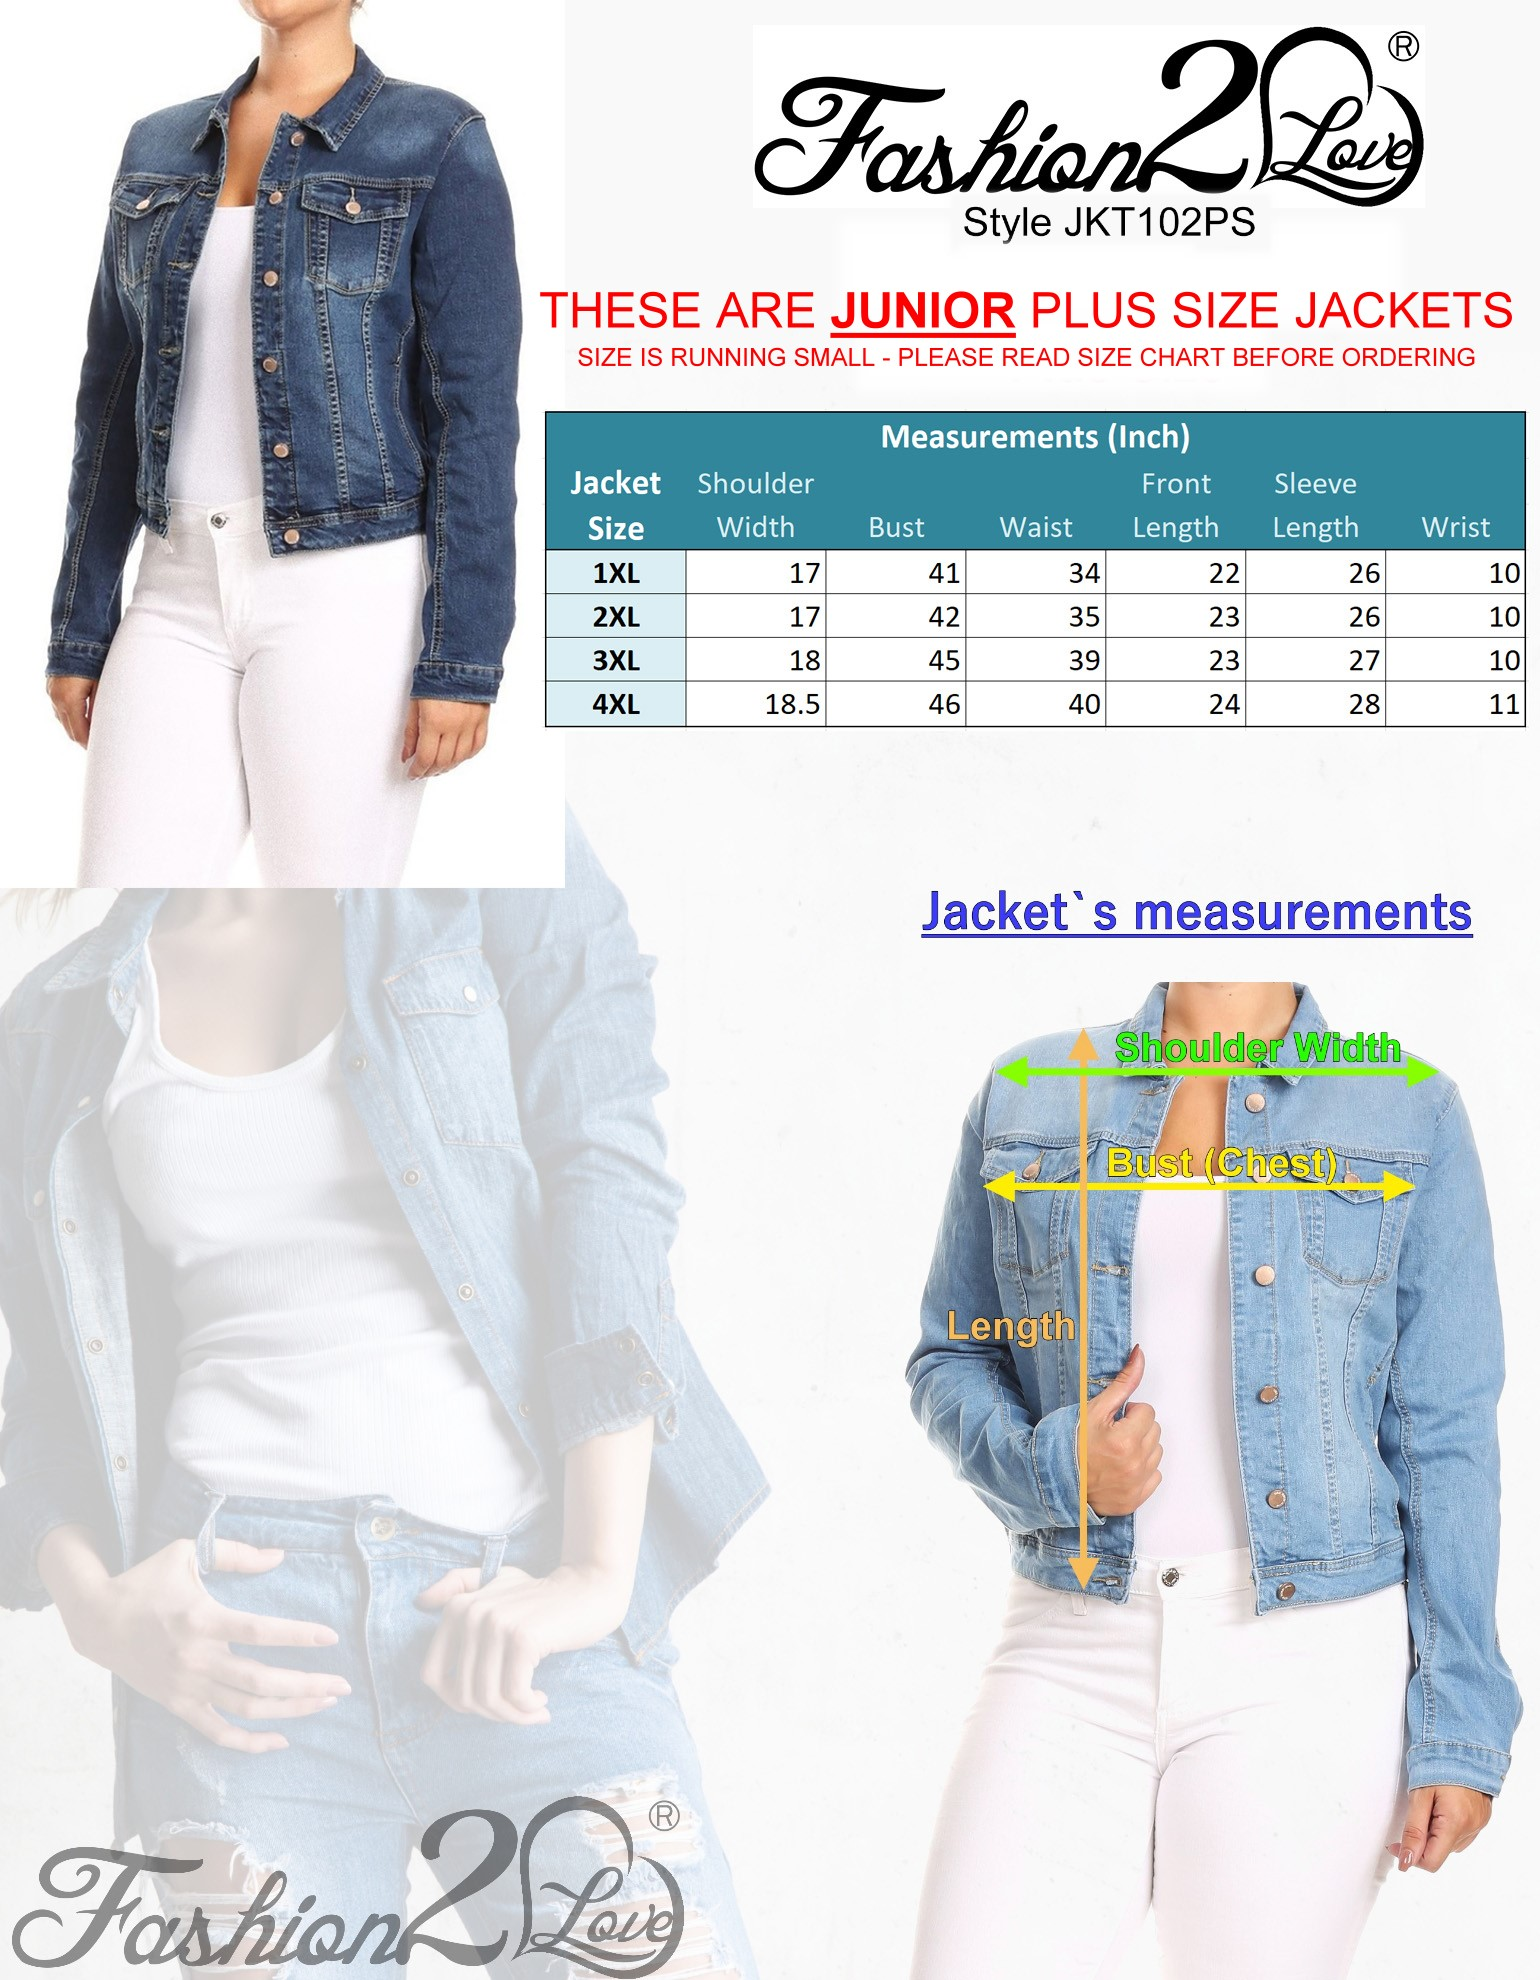 JKT102PS-Women-039-s-Plus-Size-Premium-Denim-Jackets-Long-Sleeve-Loose-Jean-Coats thumbnail 10